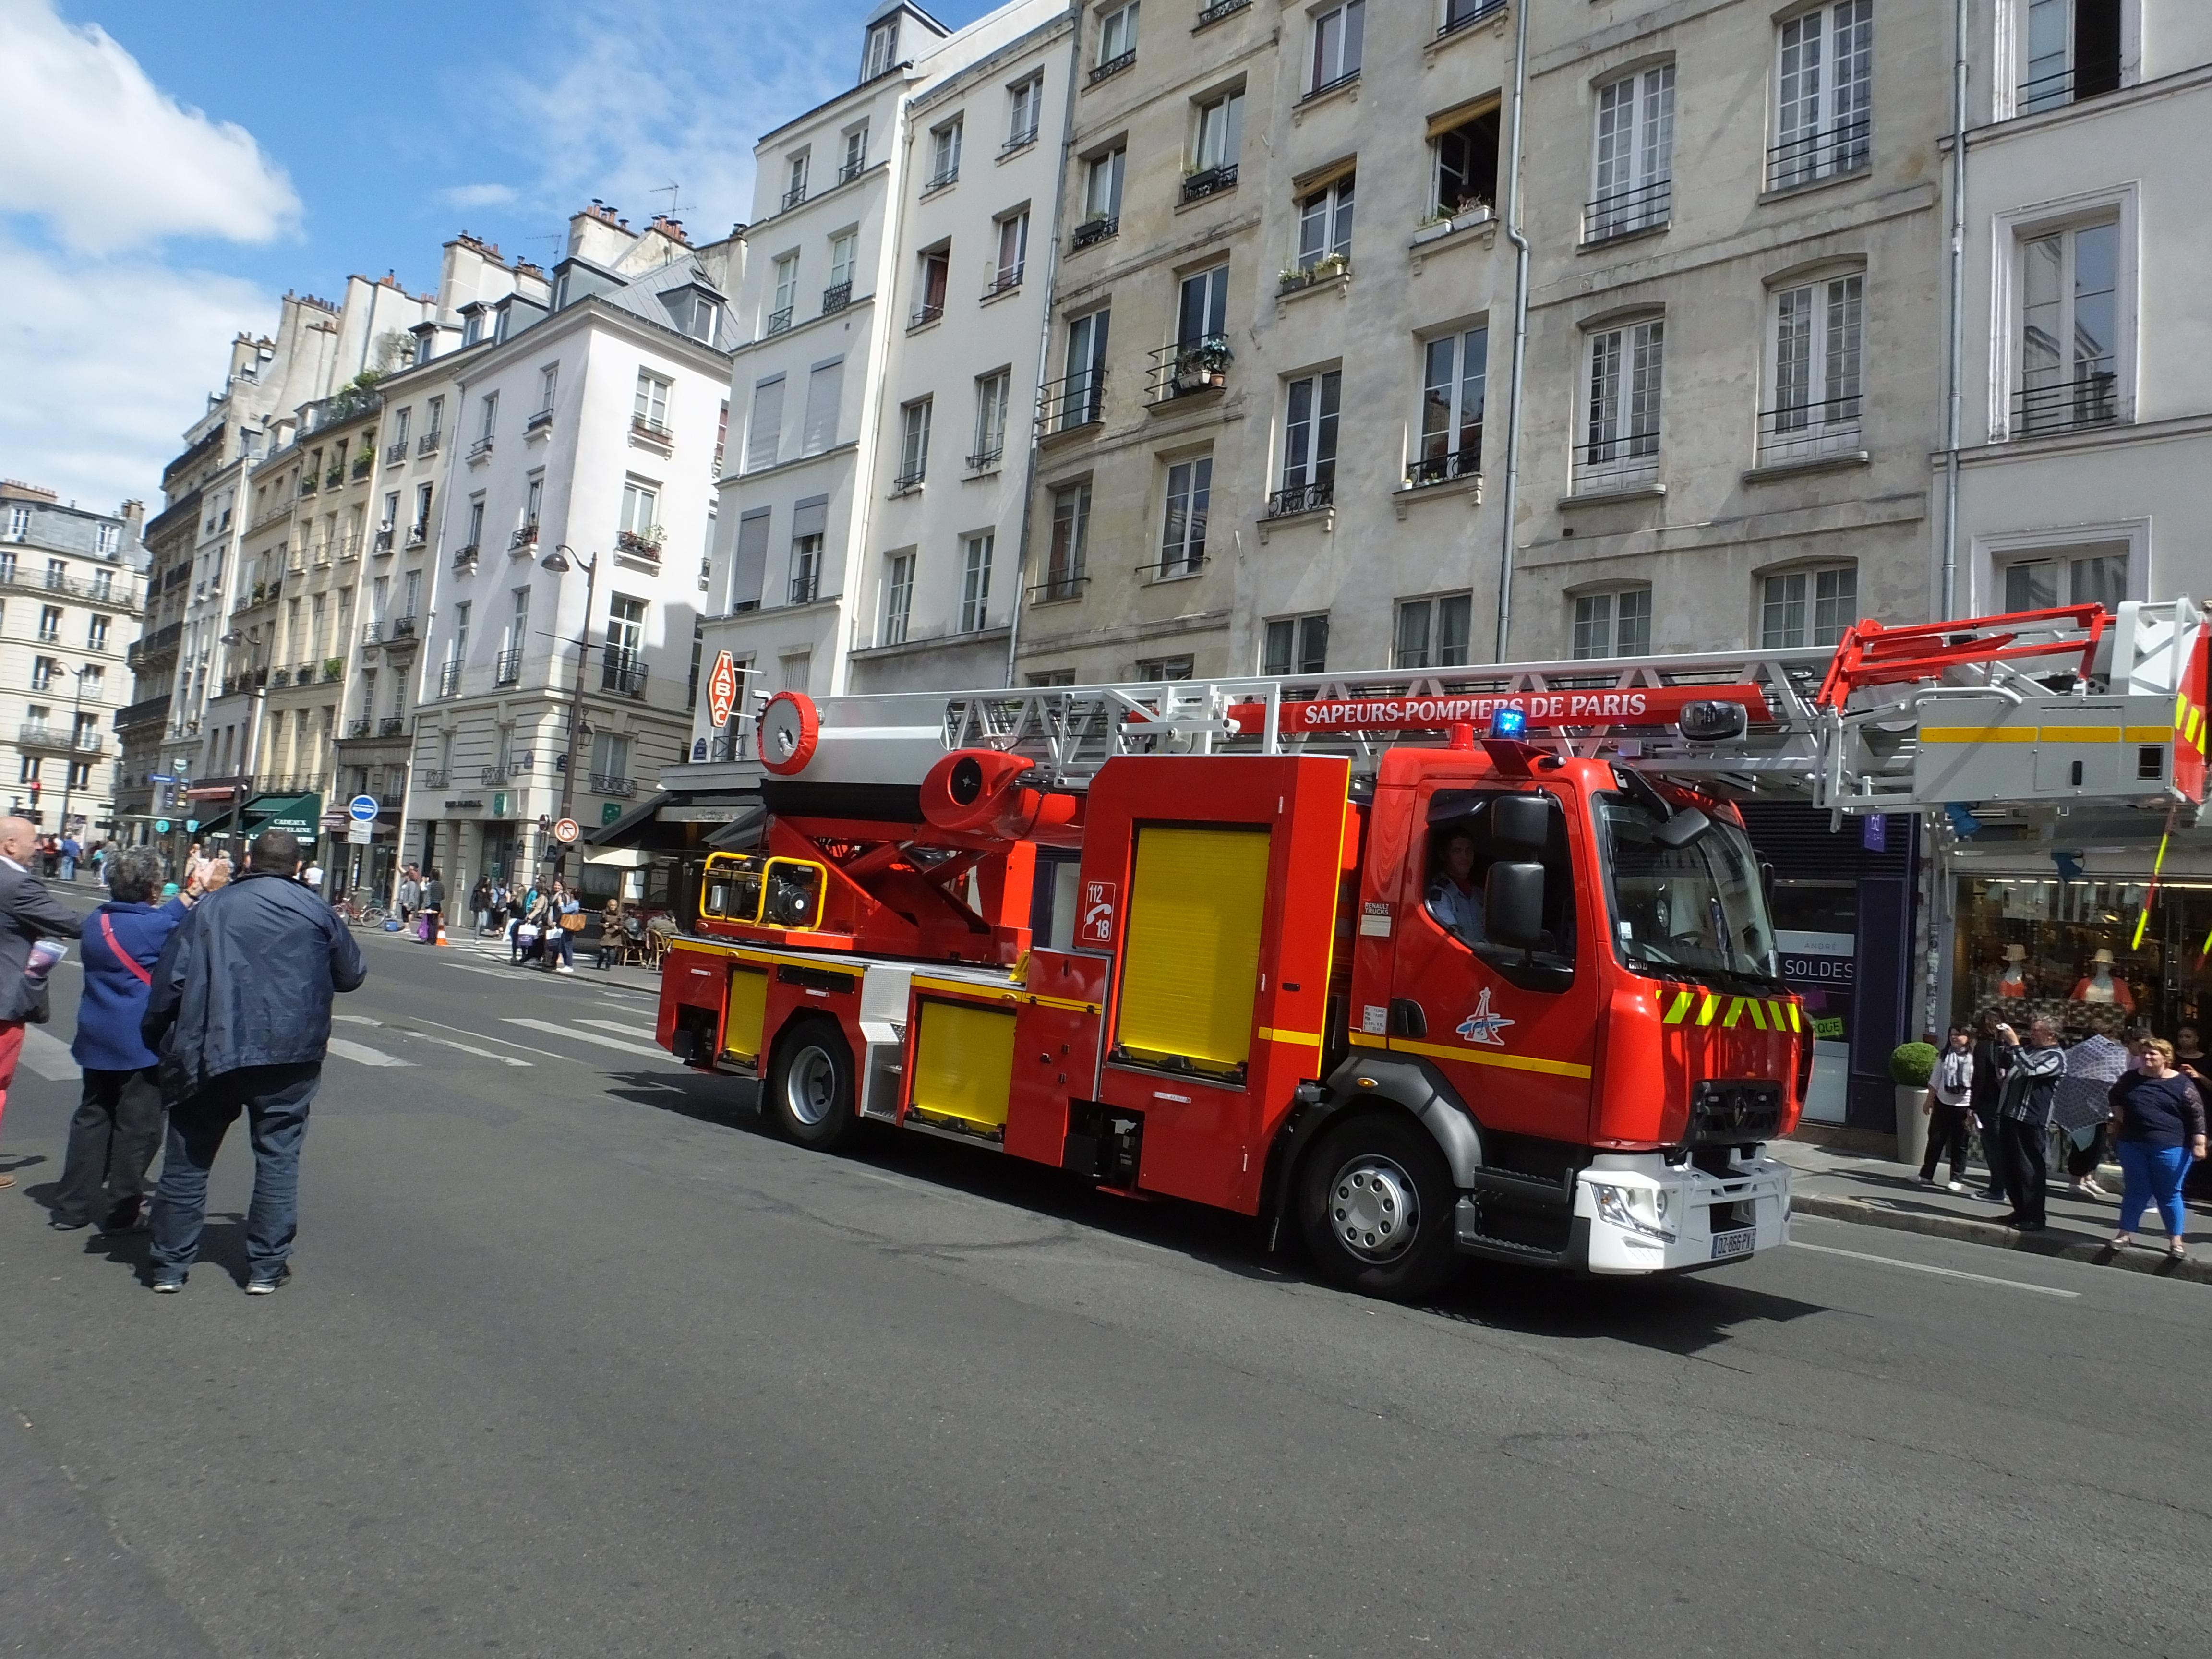 The beloved pompiers or firemen